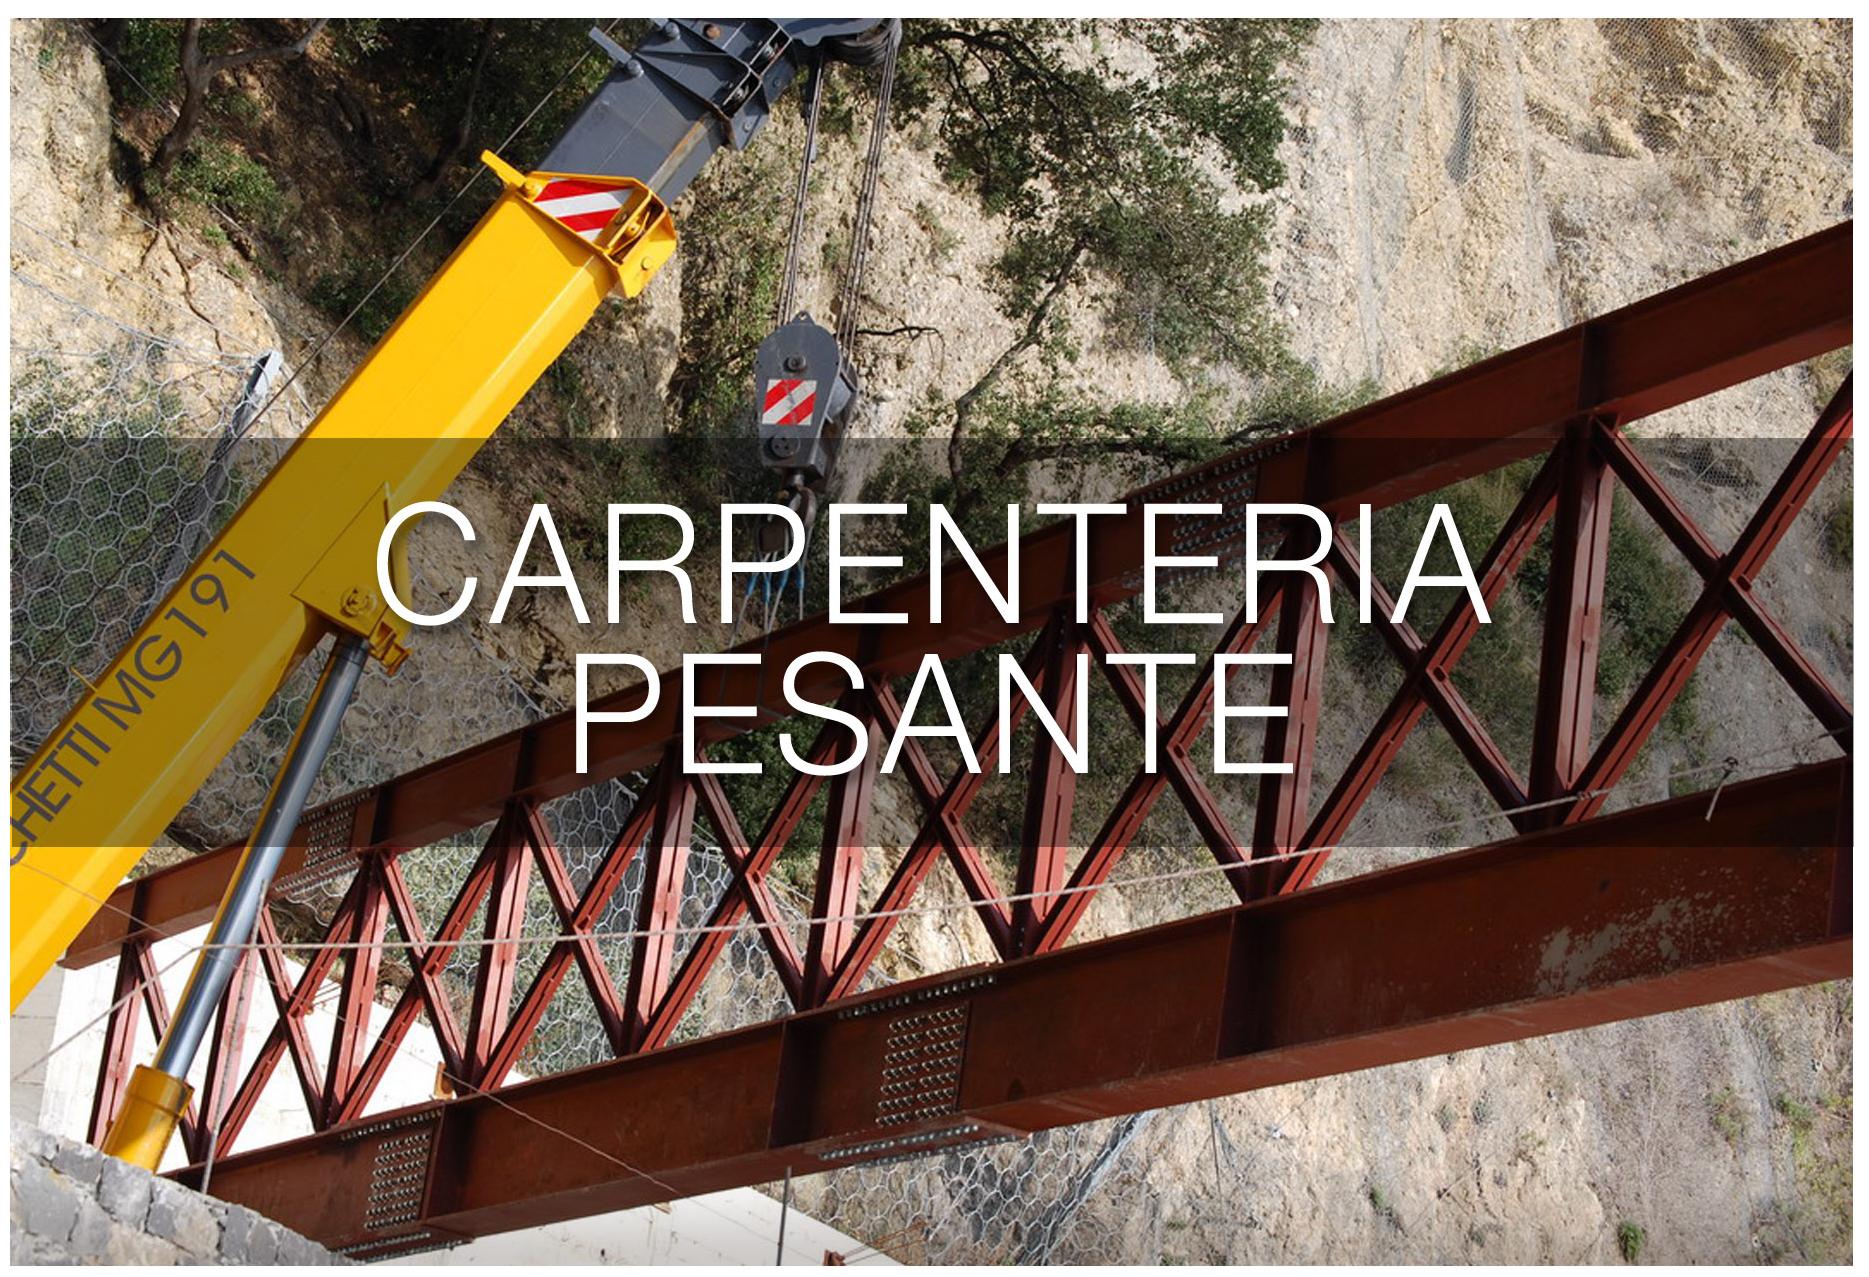 Carpenteria Pesante